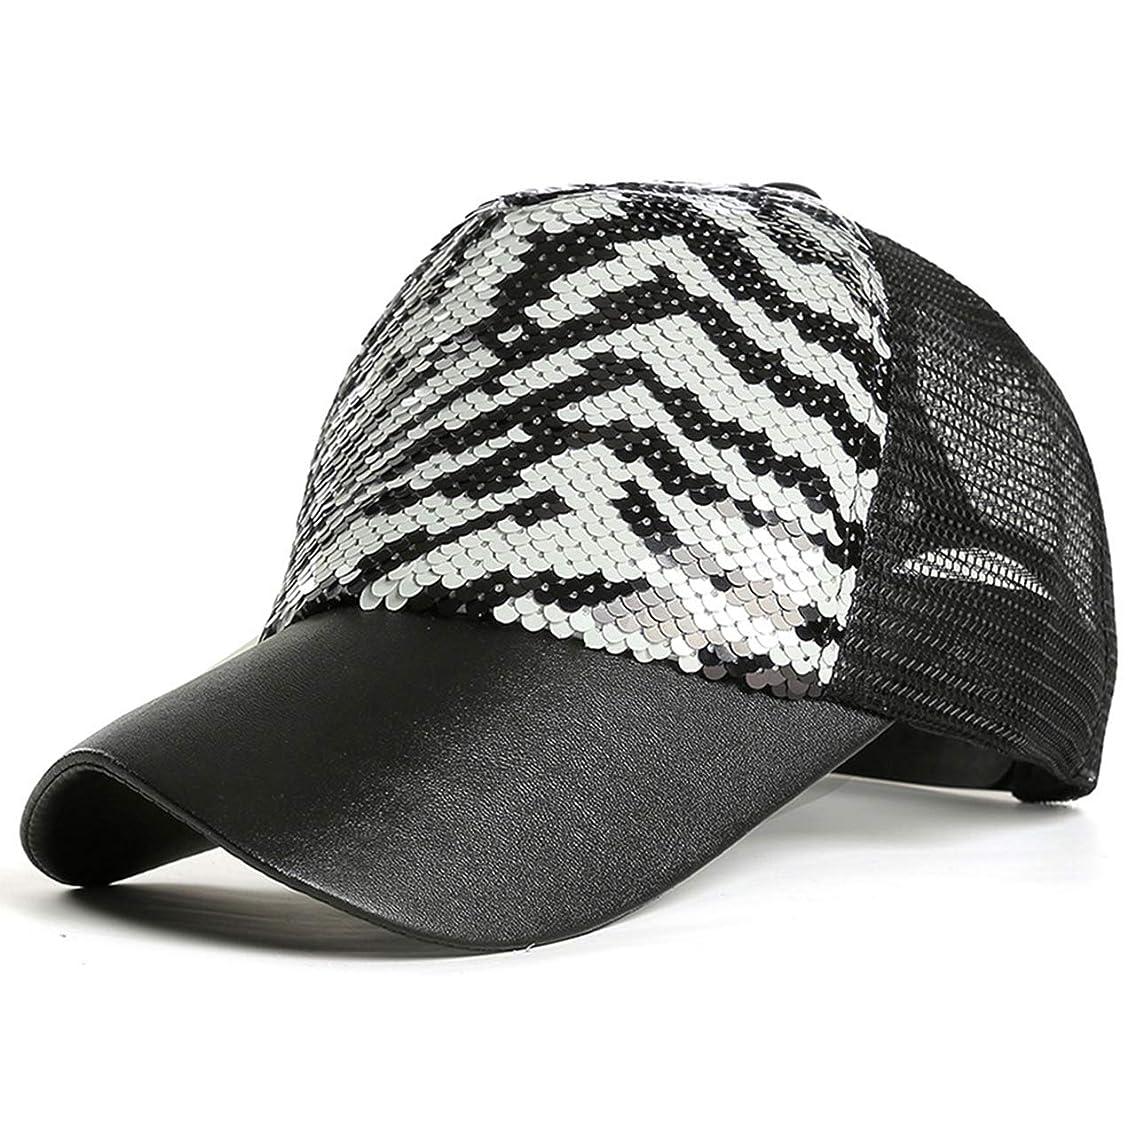 Ayliss Unisex Sequin Mesh Trucker Hat Baseball Cap Hip-hop Snapback Hat for Women/Men